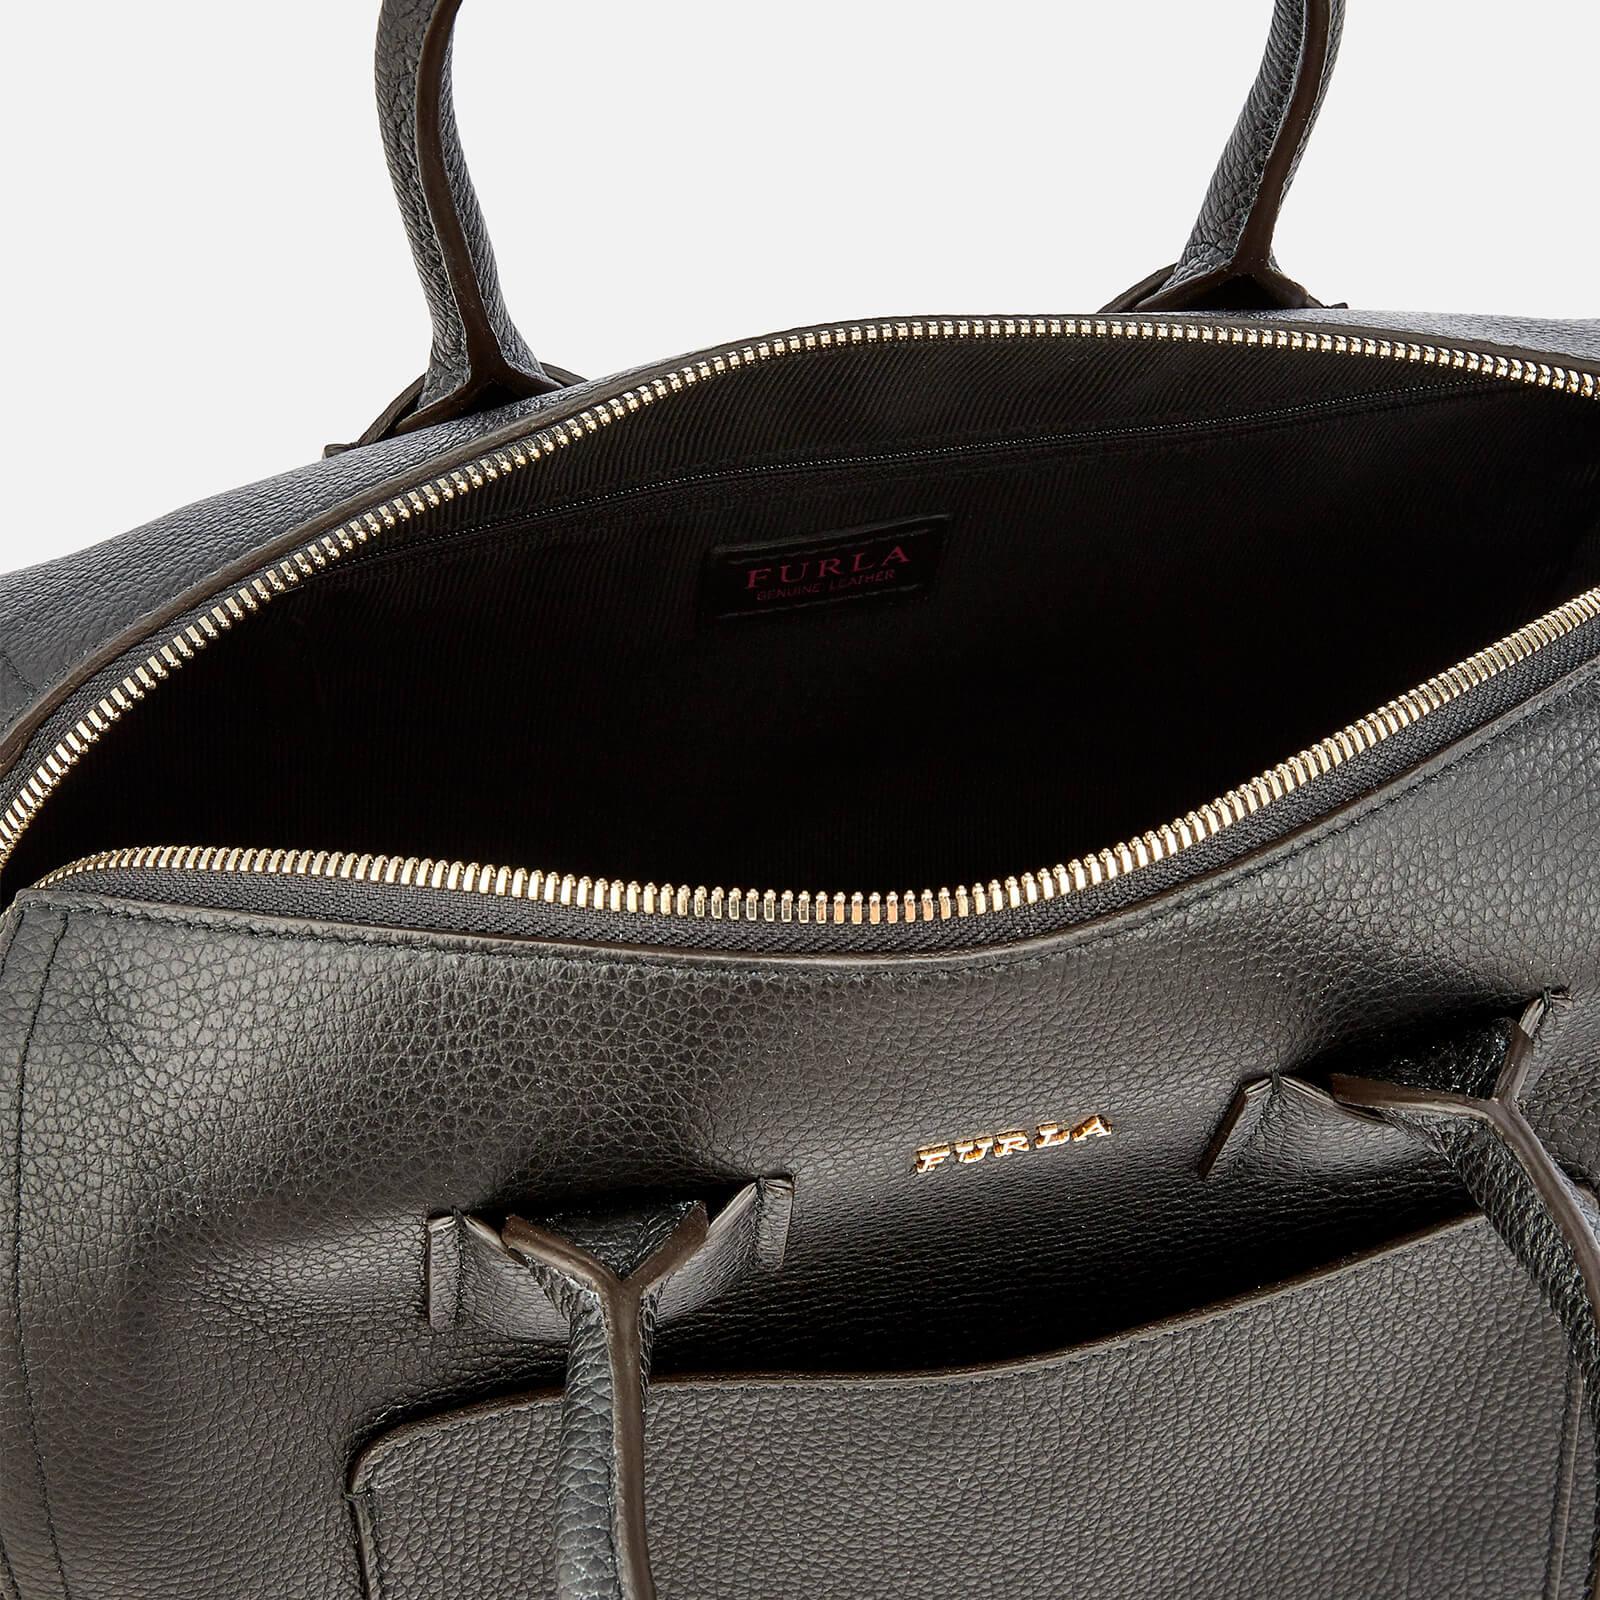 3. Furla Women's Metropolis Small Cross Body Bag - Beige 原價290英鎊 優惠價174英鎊